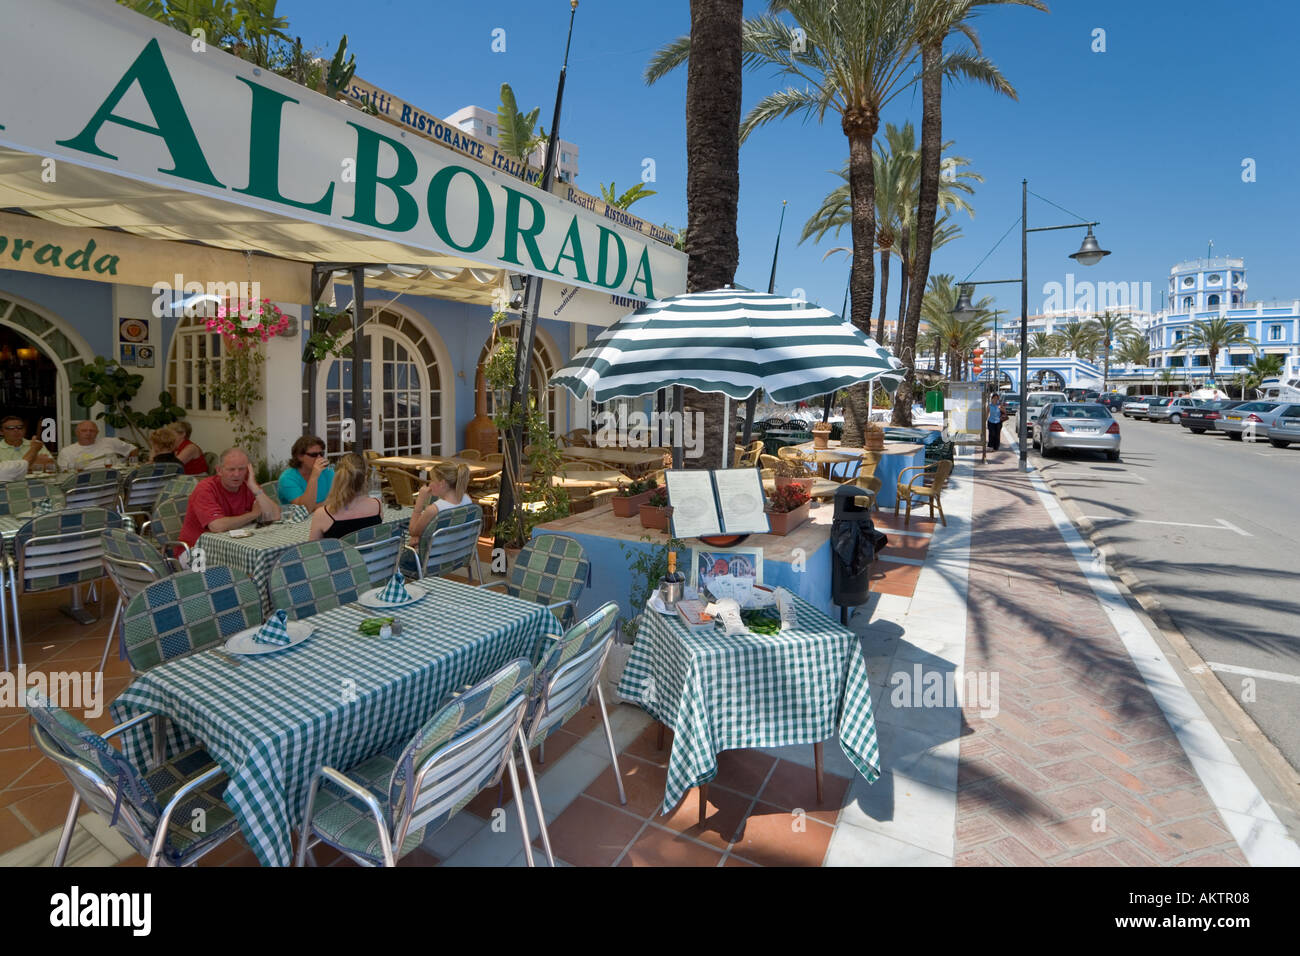 Restaurant in the Marina, Estepona, Costa del Sol, Andalucia, Spain - Stock Image